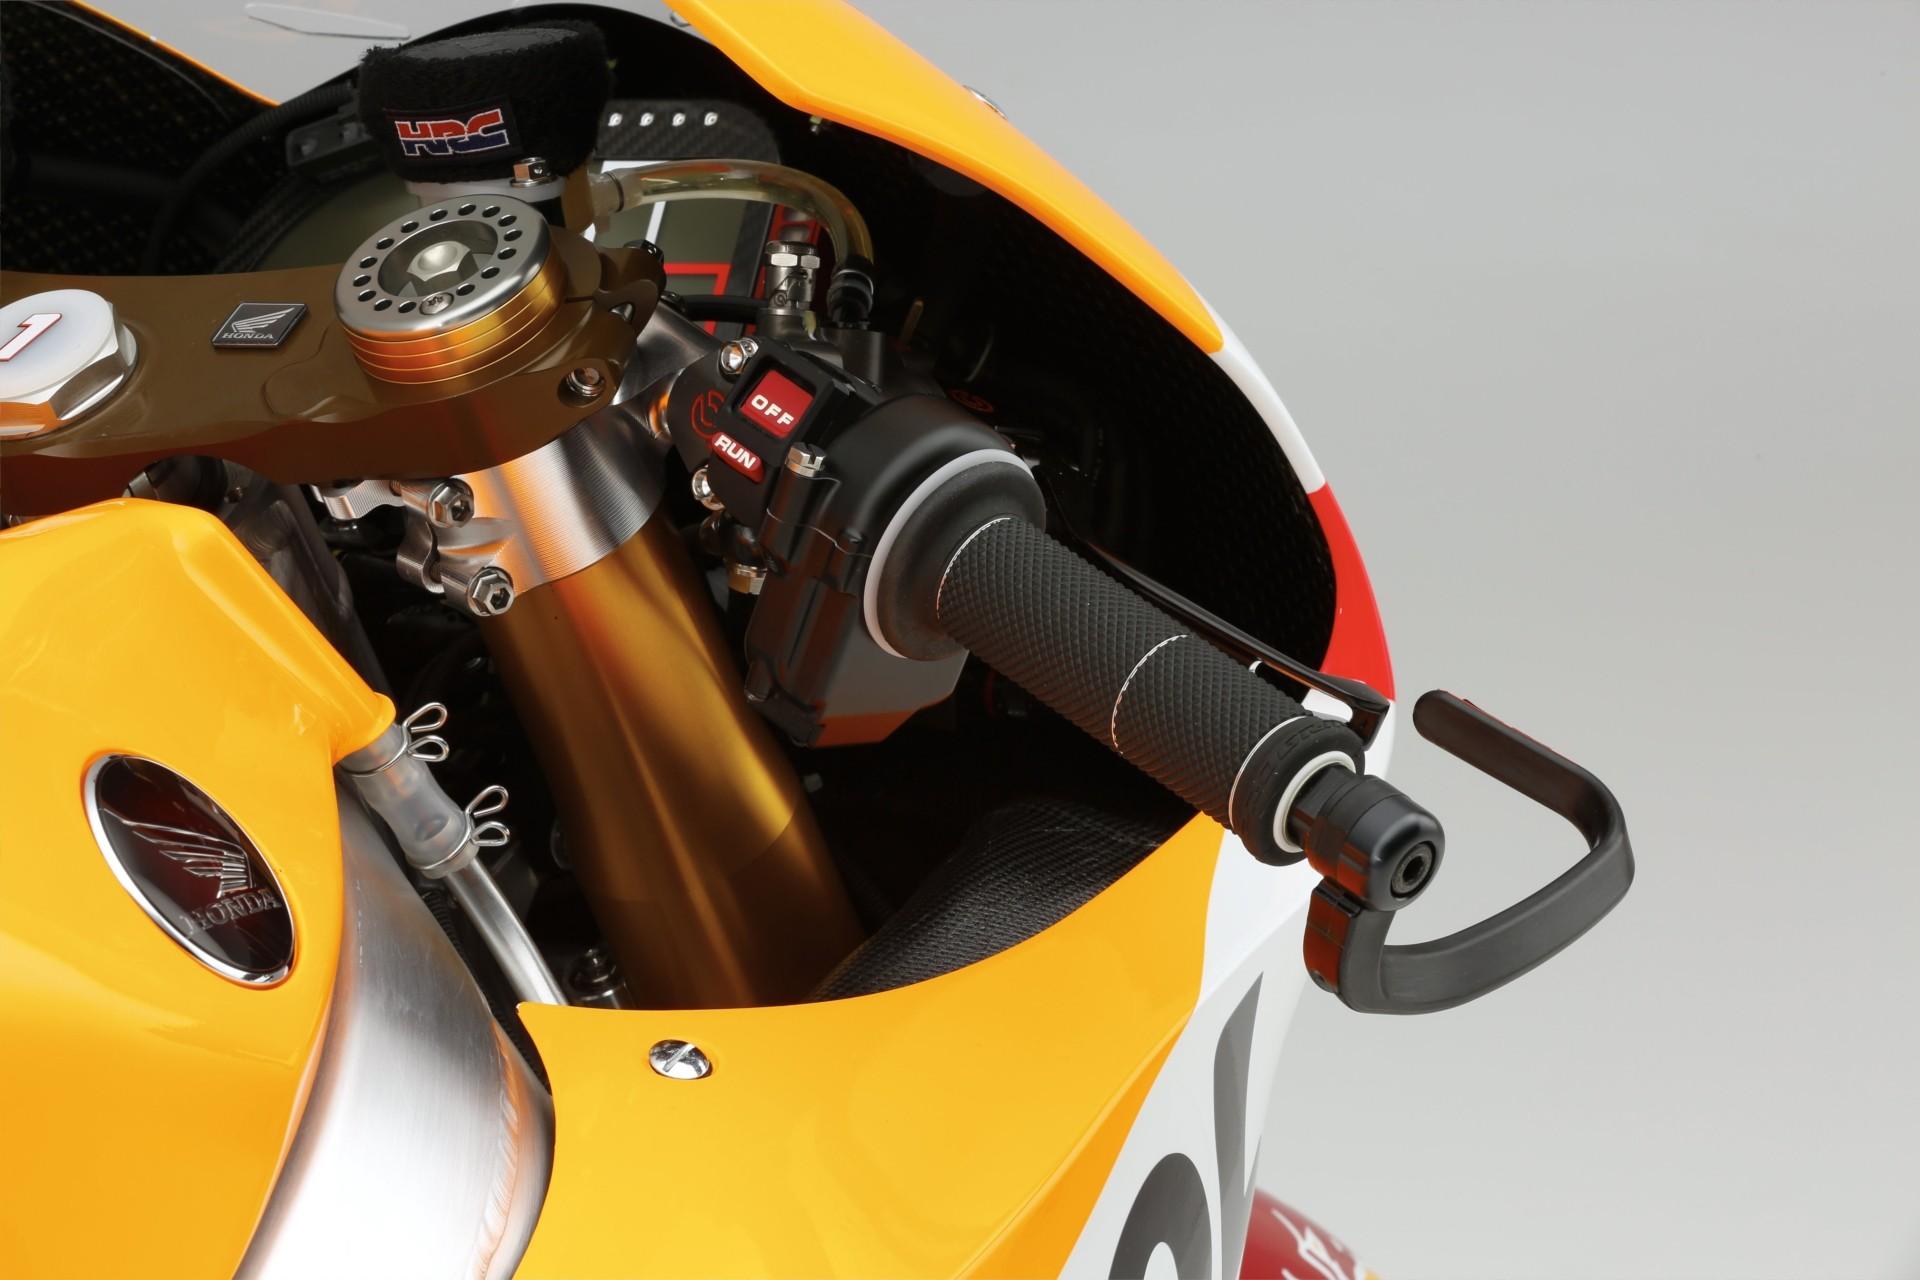 Honda RC213V S Street Bike to Make EICMA Debut